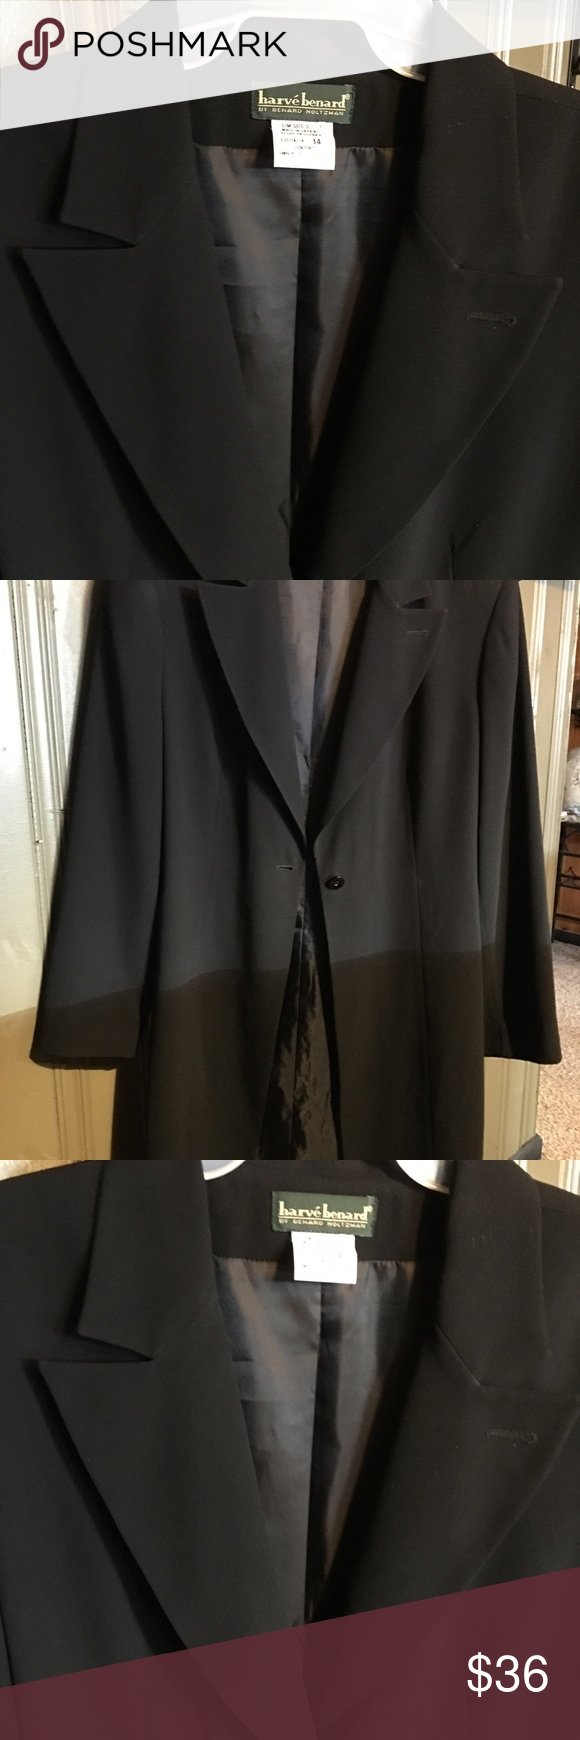 Like New Ladies Black Dress Above Knee Jacket Elegant N Very Nice To Have Dress Jacket Looks Great One Button Harv Womens Black Dress Black Dress Jackets [ 1740 x 580 Pixel ]